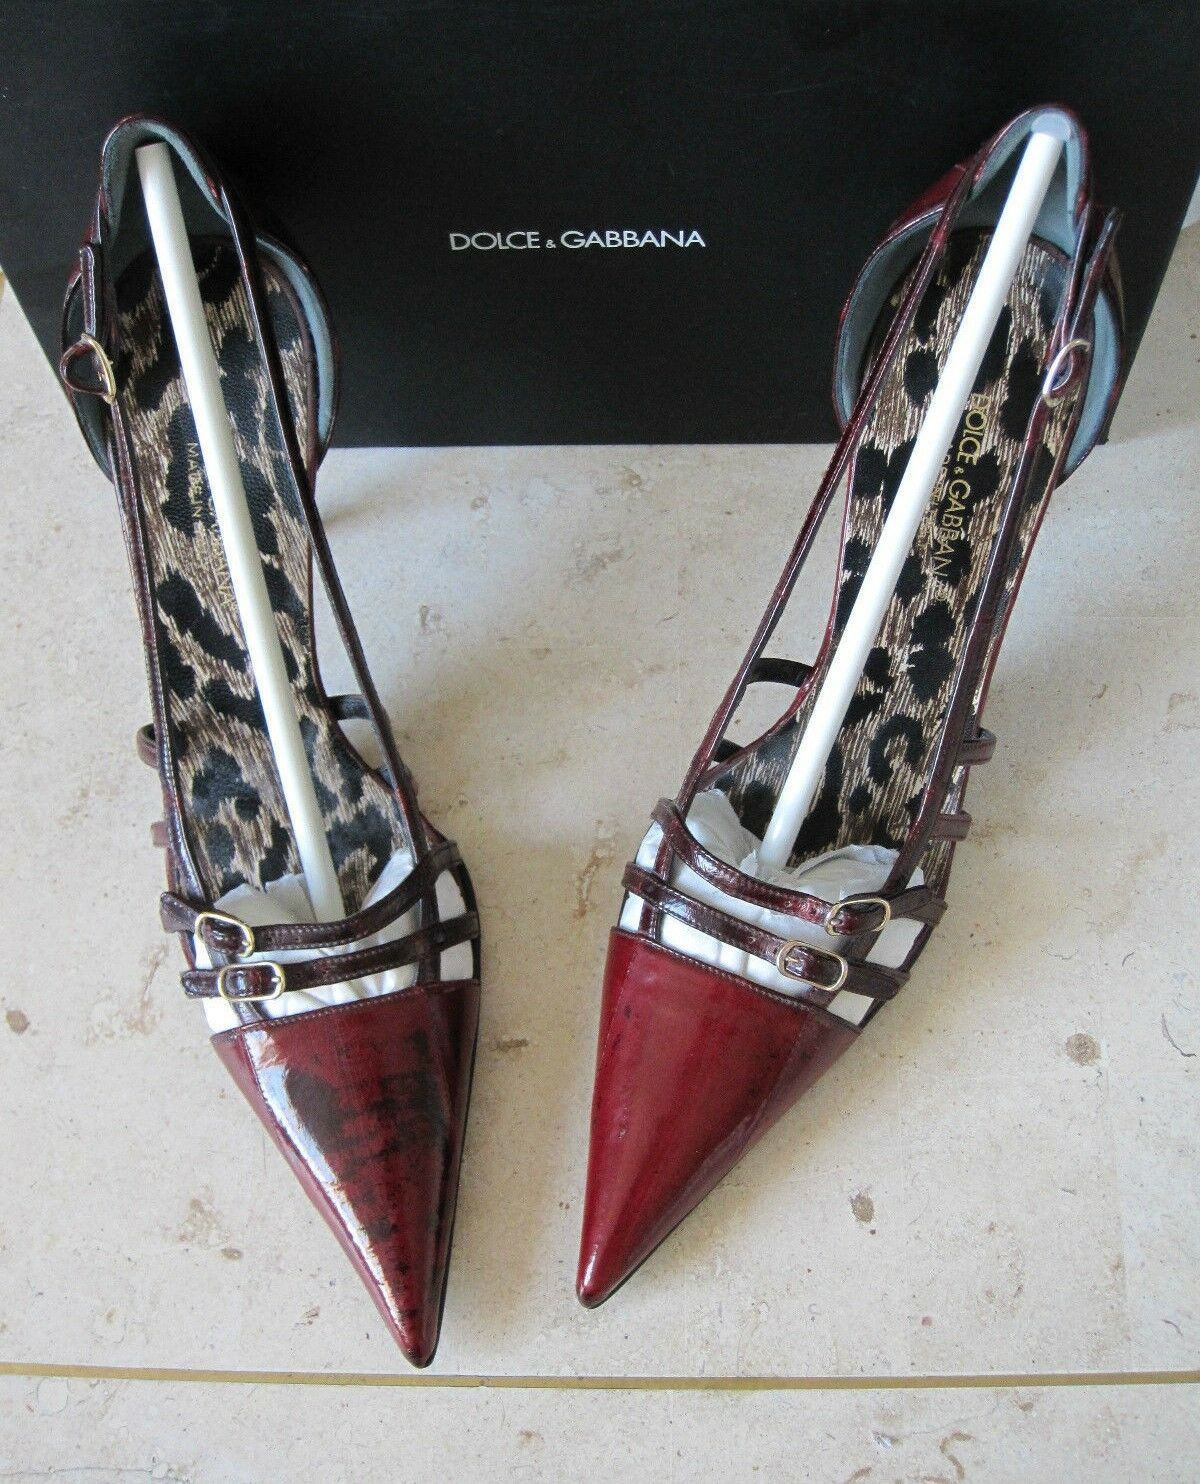 Descuento de liquidación Rare! *DOLCE&GABBANA* Vtg Mary Jane EEL SKIN Pink-Red Brown Point Stiletto Heels